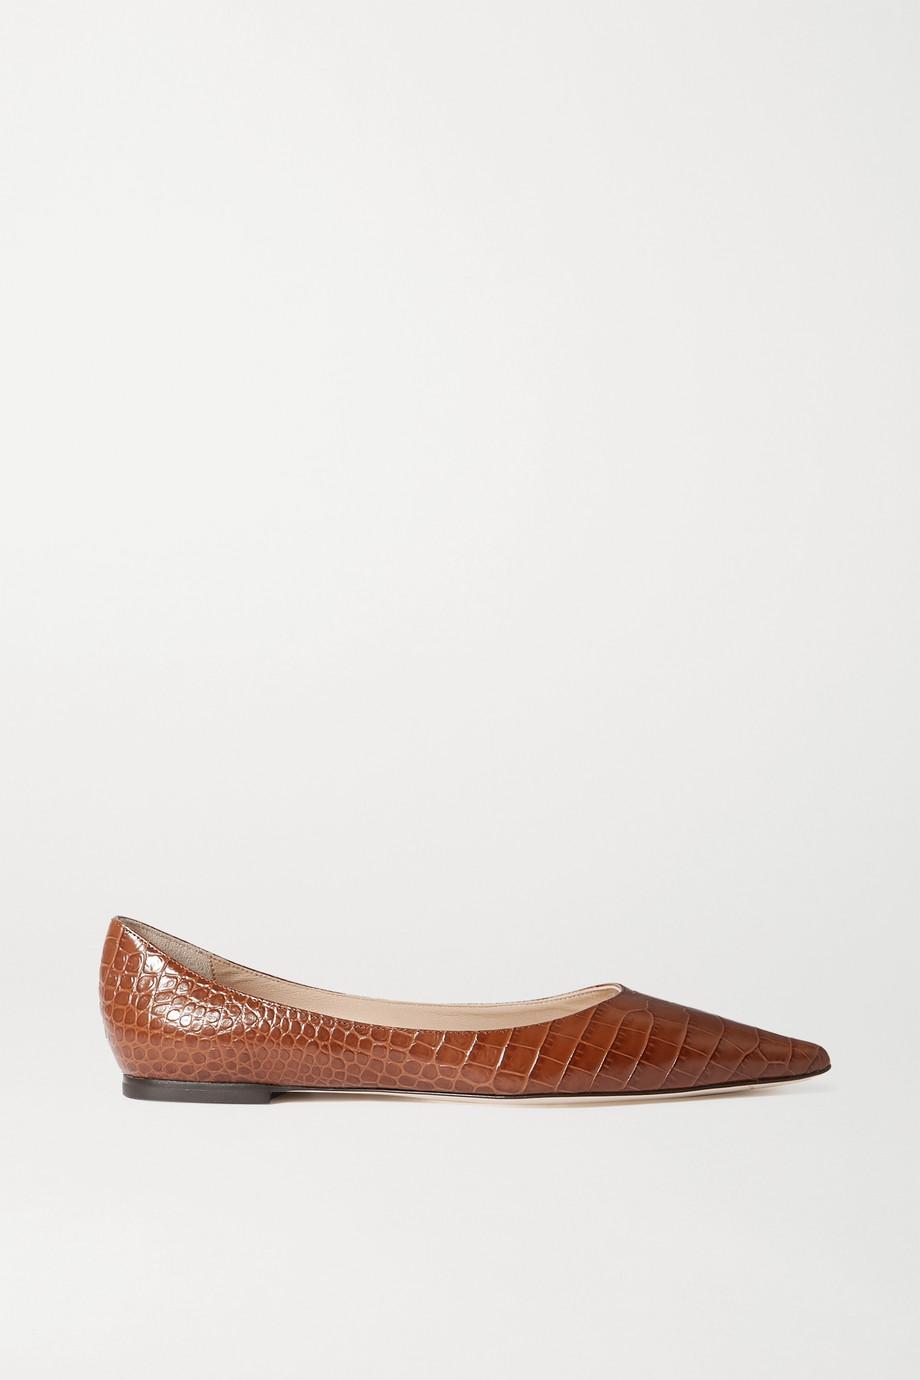 Jimmy Choo Love croc-effect leather point-toe flats